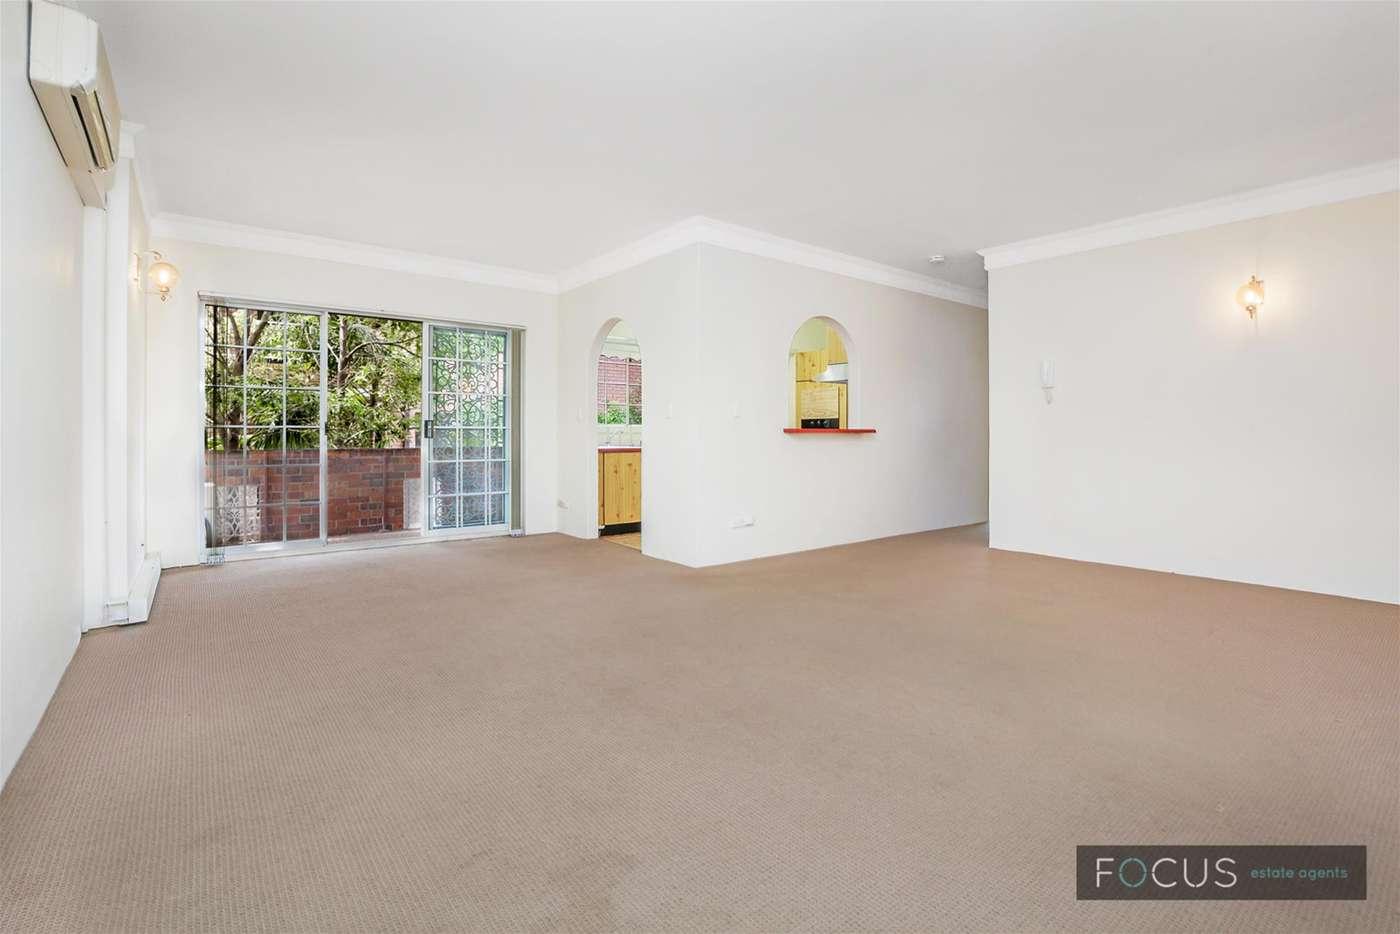 Main view of Homely unit listing, 3/57-59 Gray Street, Kogarah NSW 2217